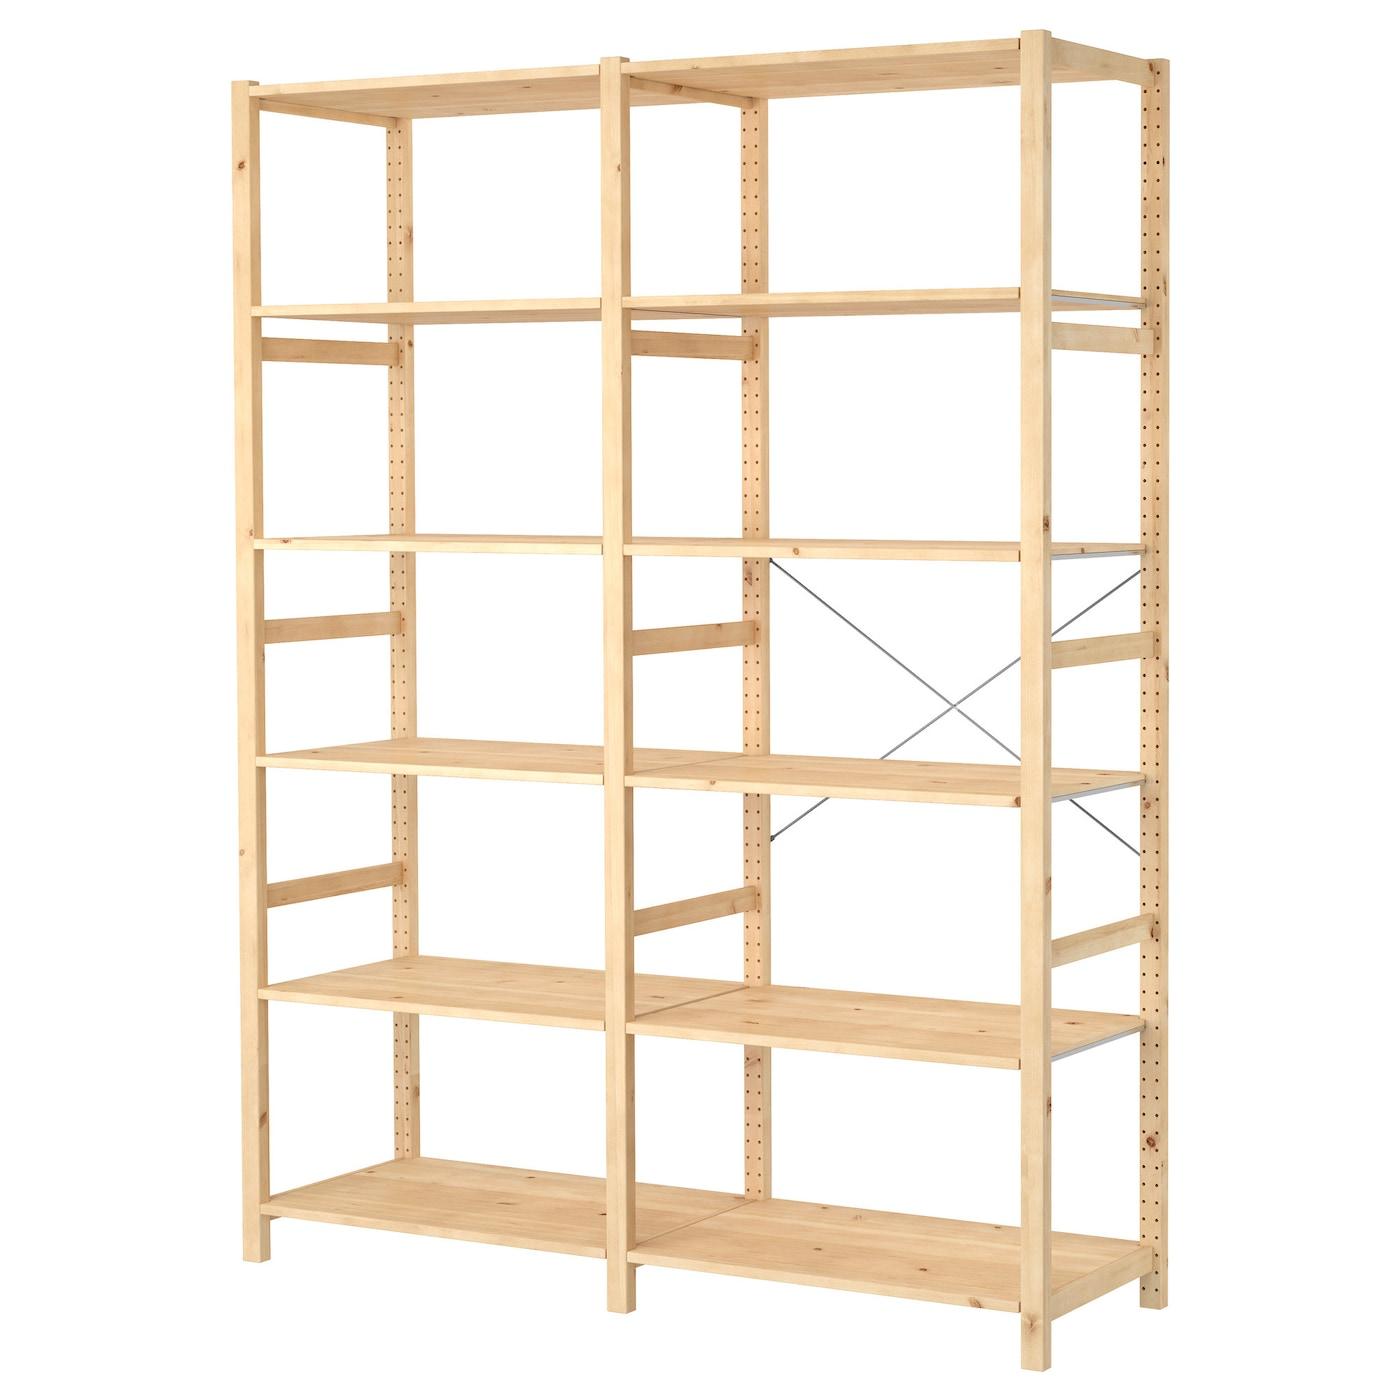 ivar 2 elementen planken grenen 174 x 50 x 226 cm ikea. Black Bedroom Furniture Sets. Home Design Ideas